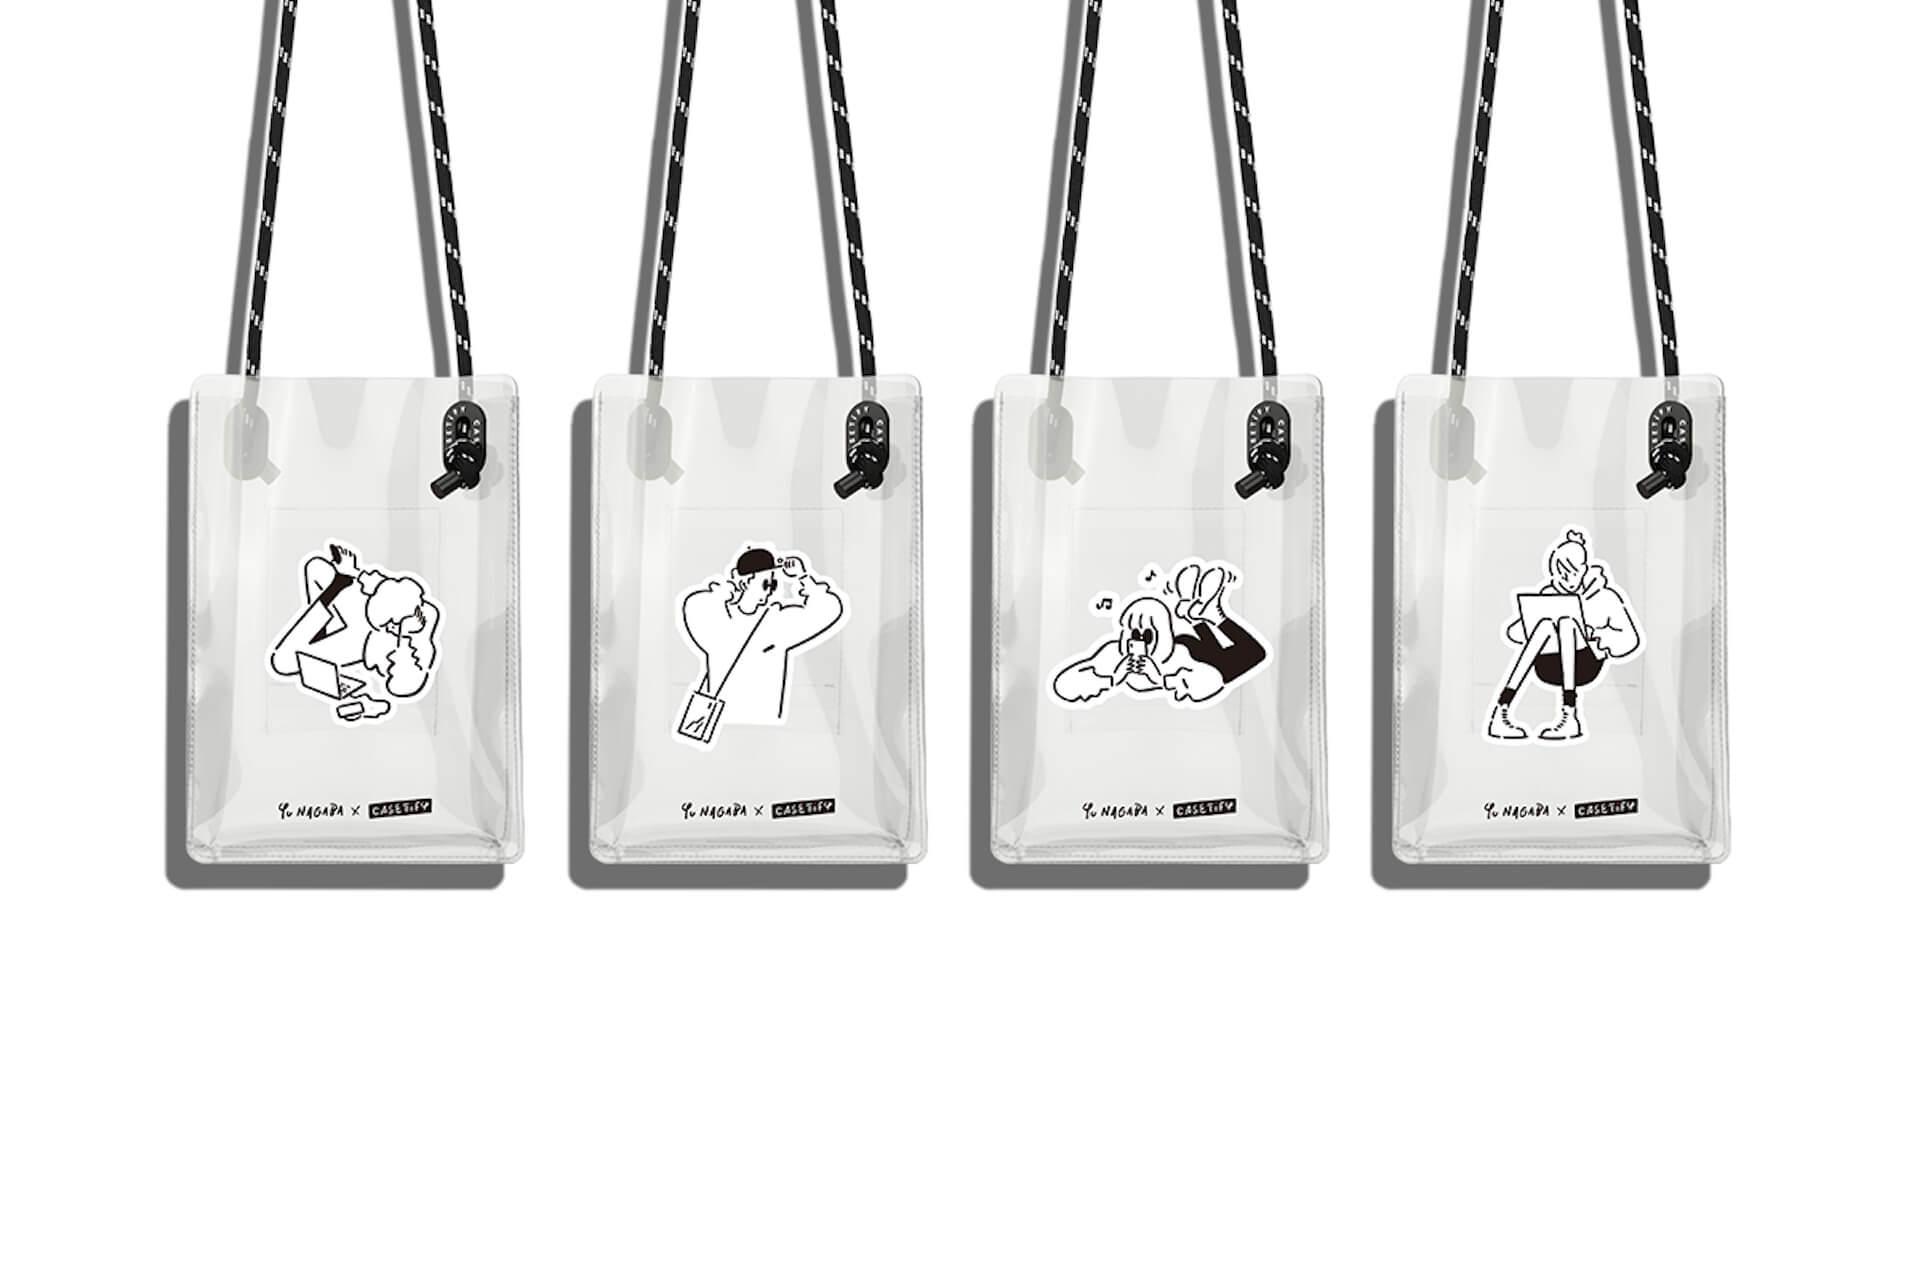 CASETiFYから「Yu Nagaba × CASETiFYコレクション」が登場!描き下ろし手描きフォントのケースや限定アートピース販売も ac200618_castify_yunagaba_09